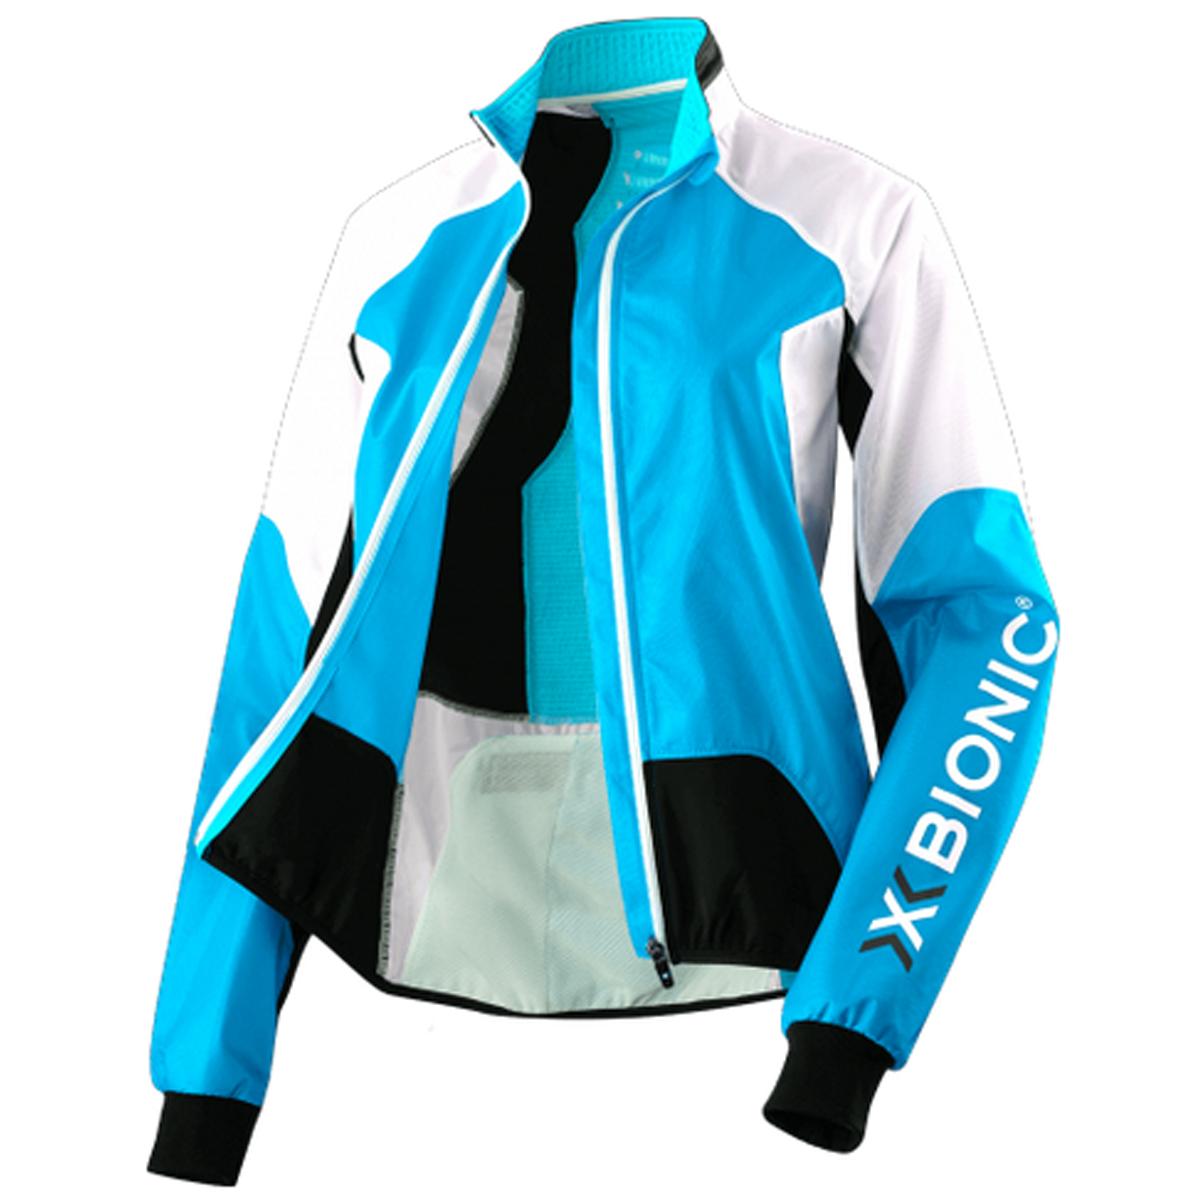 X Windjacke New Damen Biking Bionic Lady Fahrradjacke Ok8wXn0P